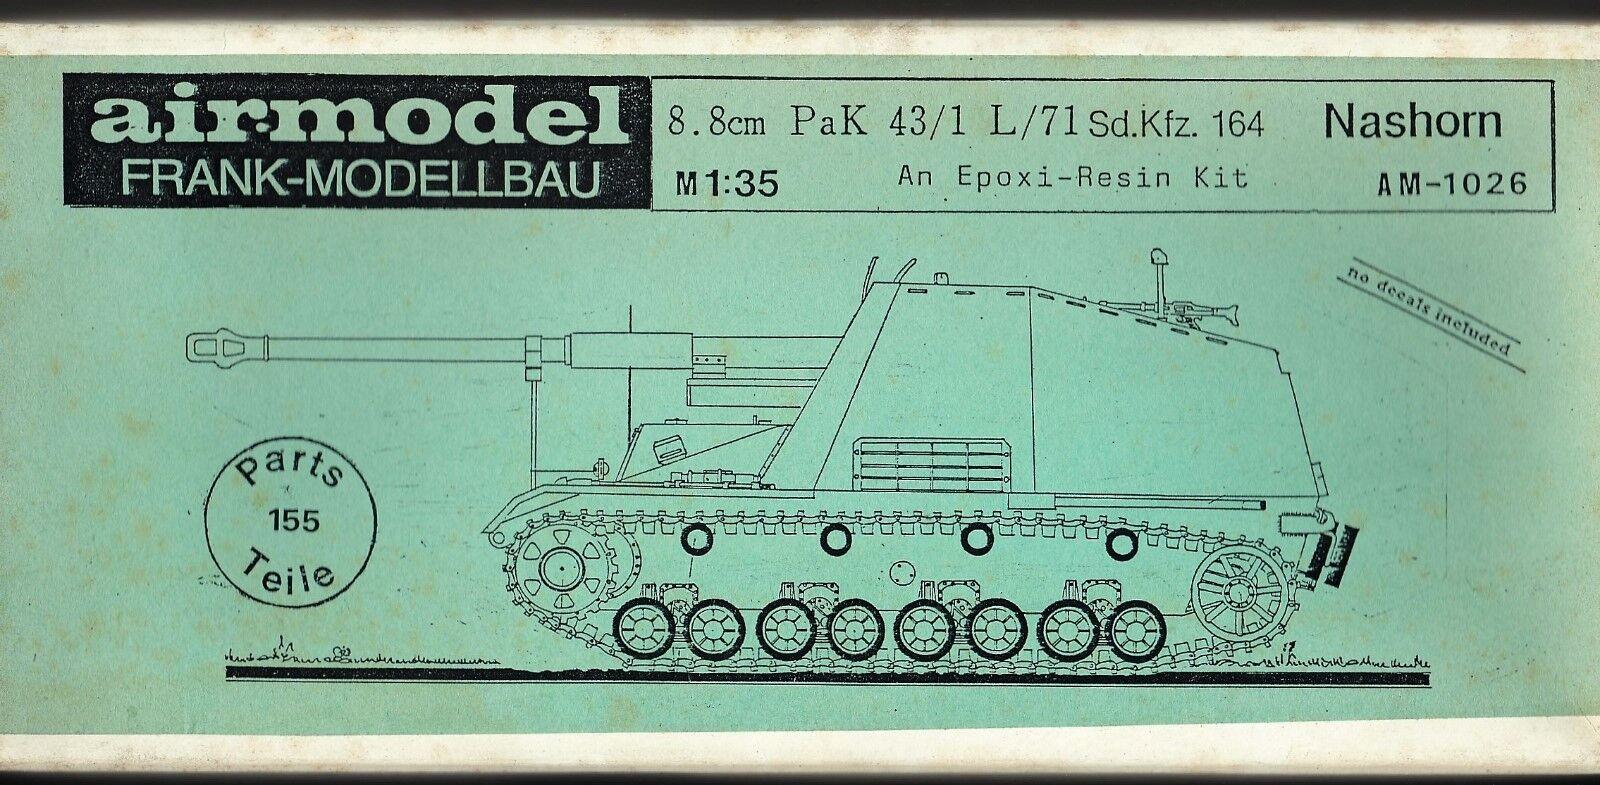 AIRMODEL PRODUCTS AM-1026 - 8.8cm 8.8cm 8.8cm PaK 43 1 L 71 Sd.Kfz.164 NASHORN - 1 35 RESIN 638348